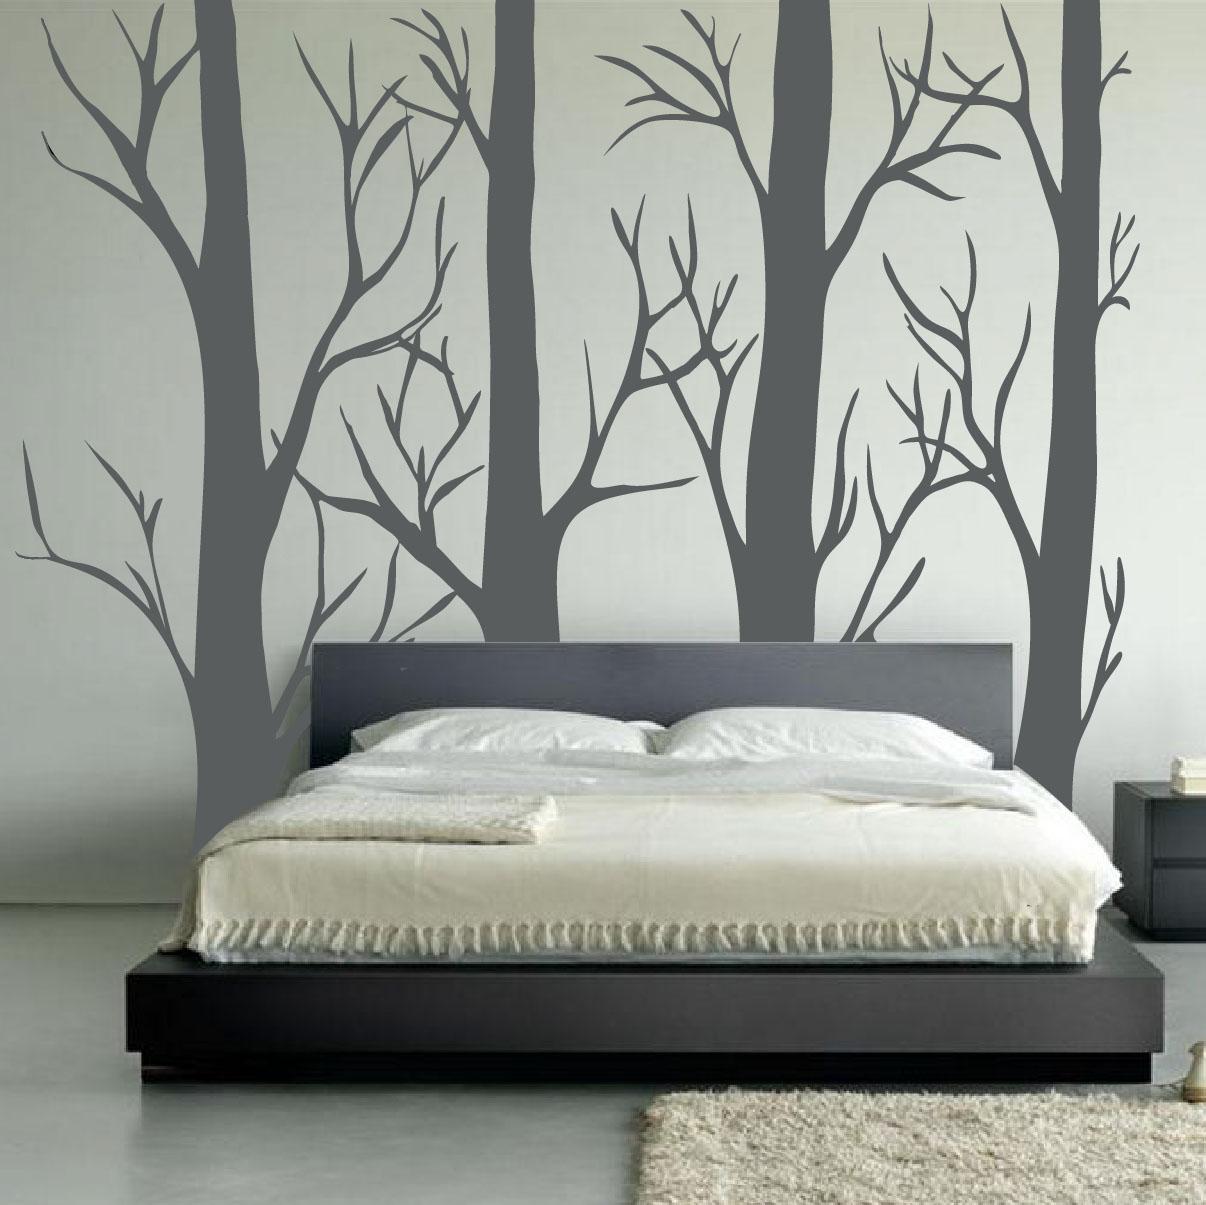 large-tree-wall-decal.jpg